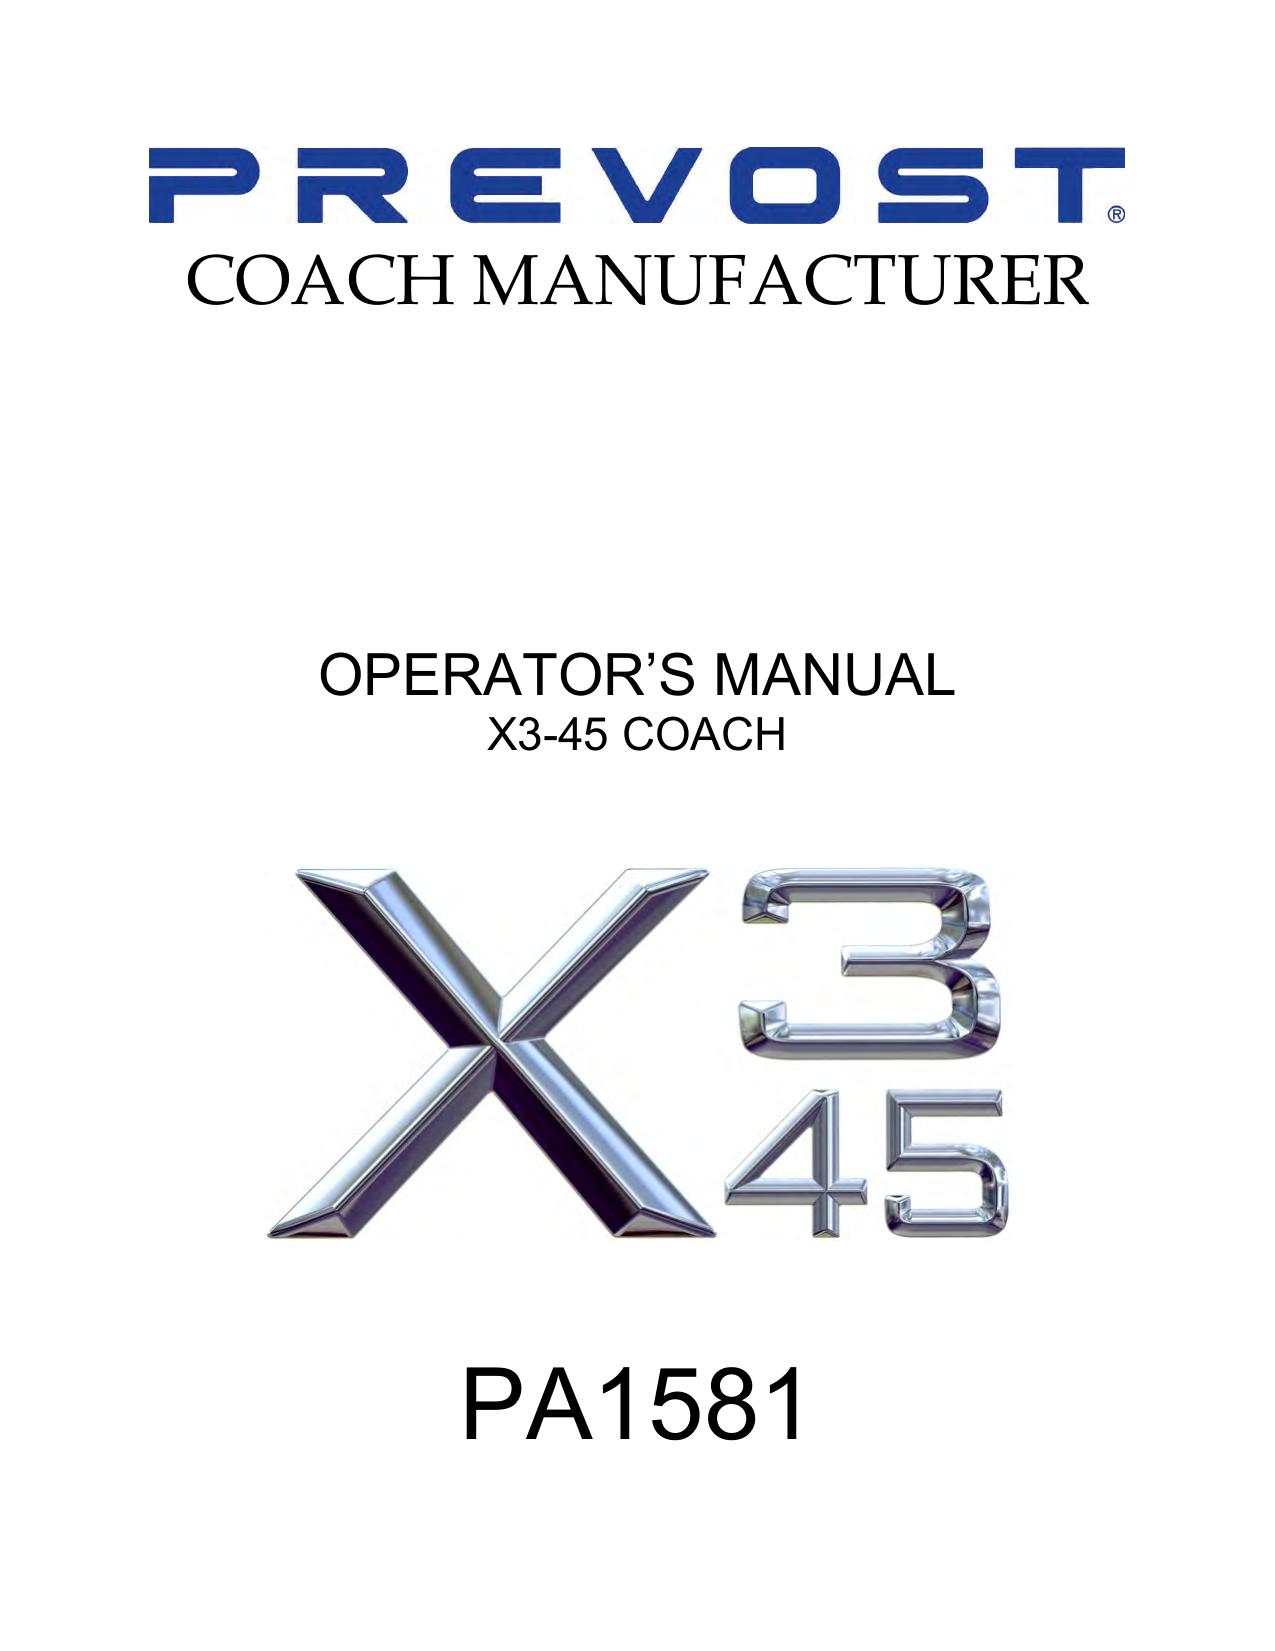 PA1581 - Prevost | manualzz com